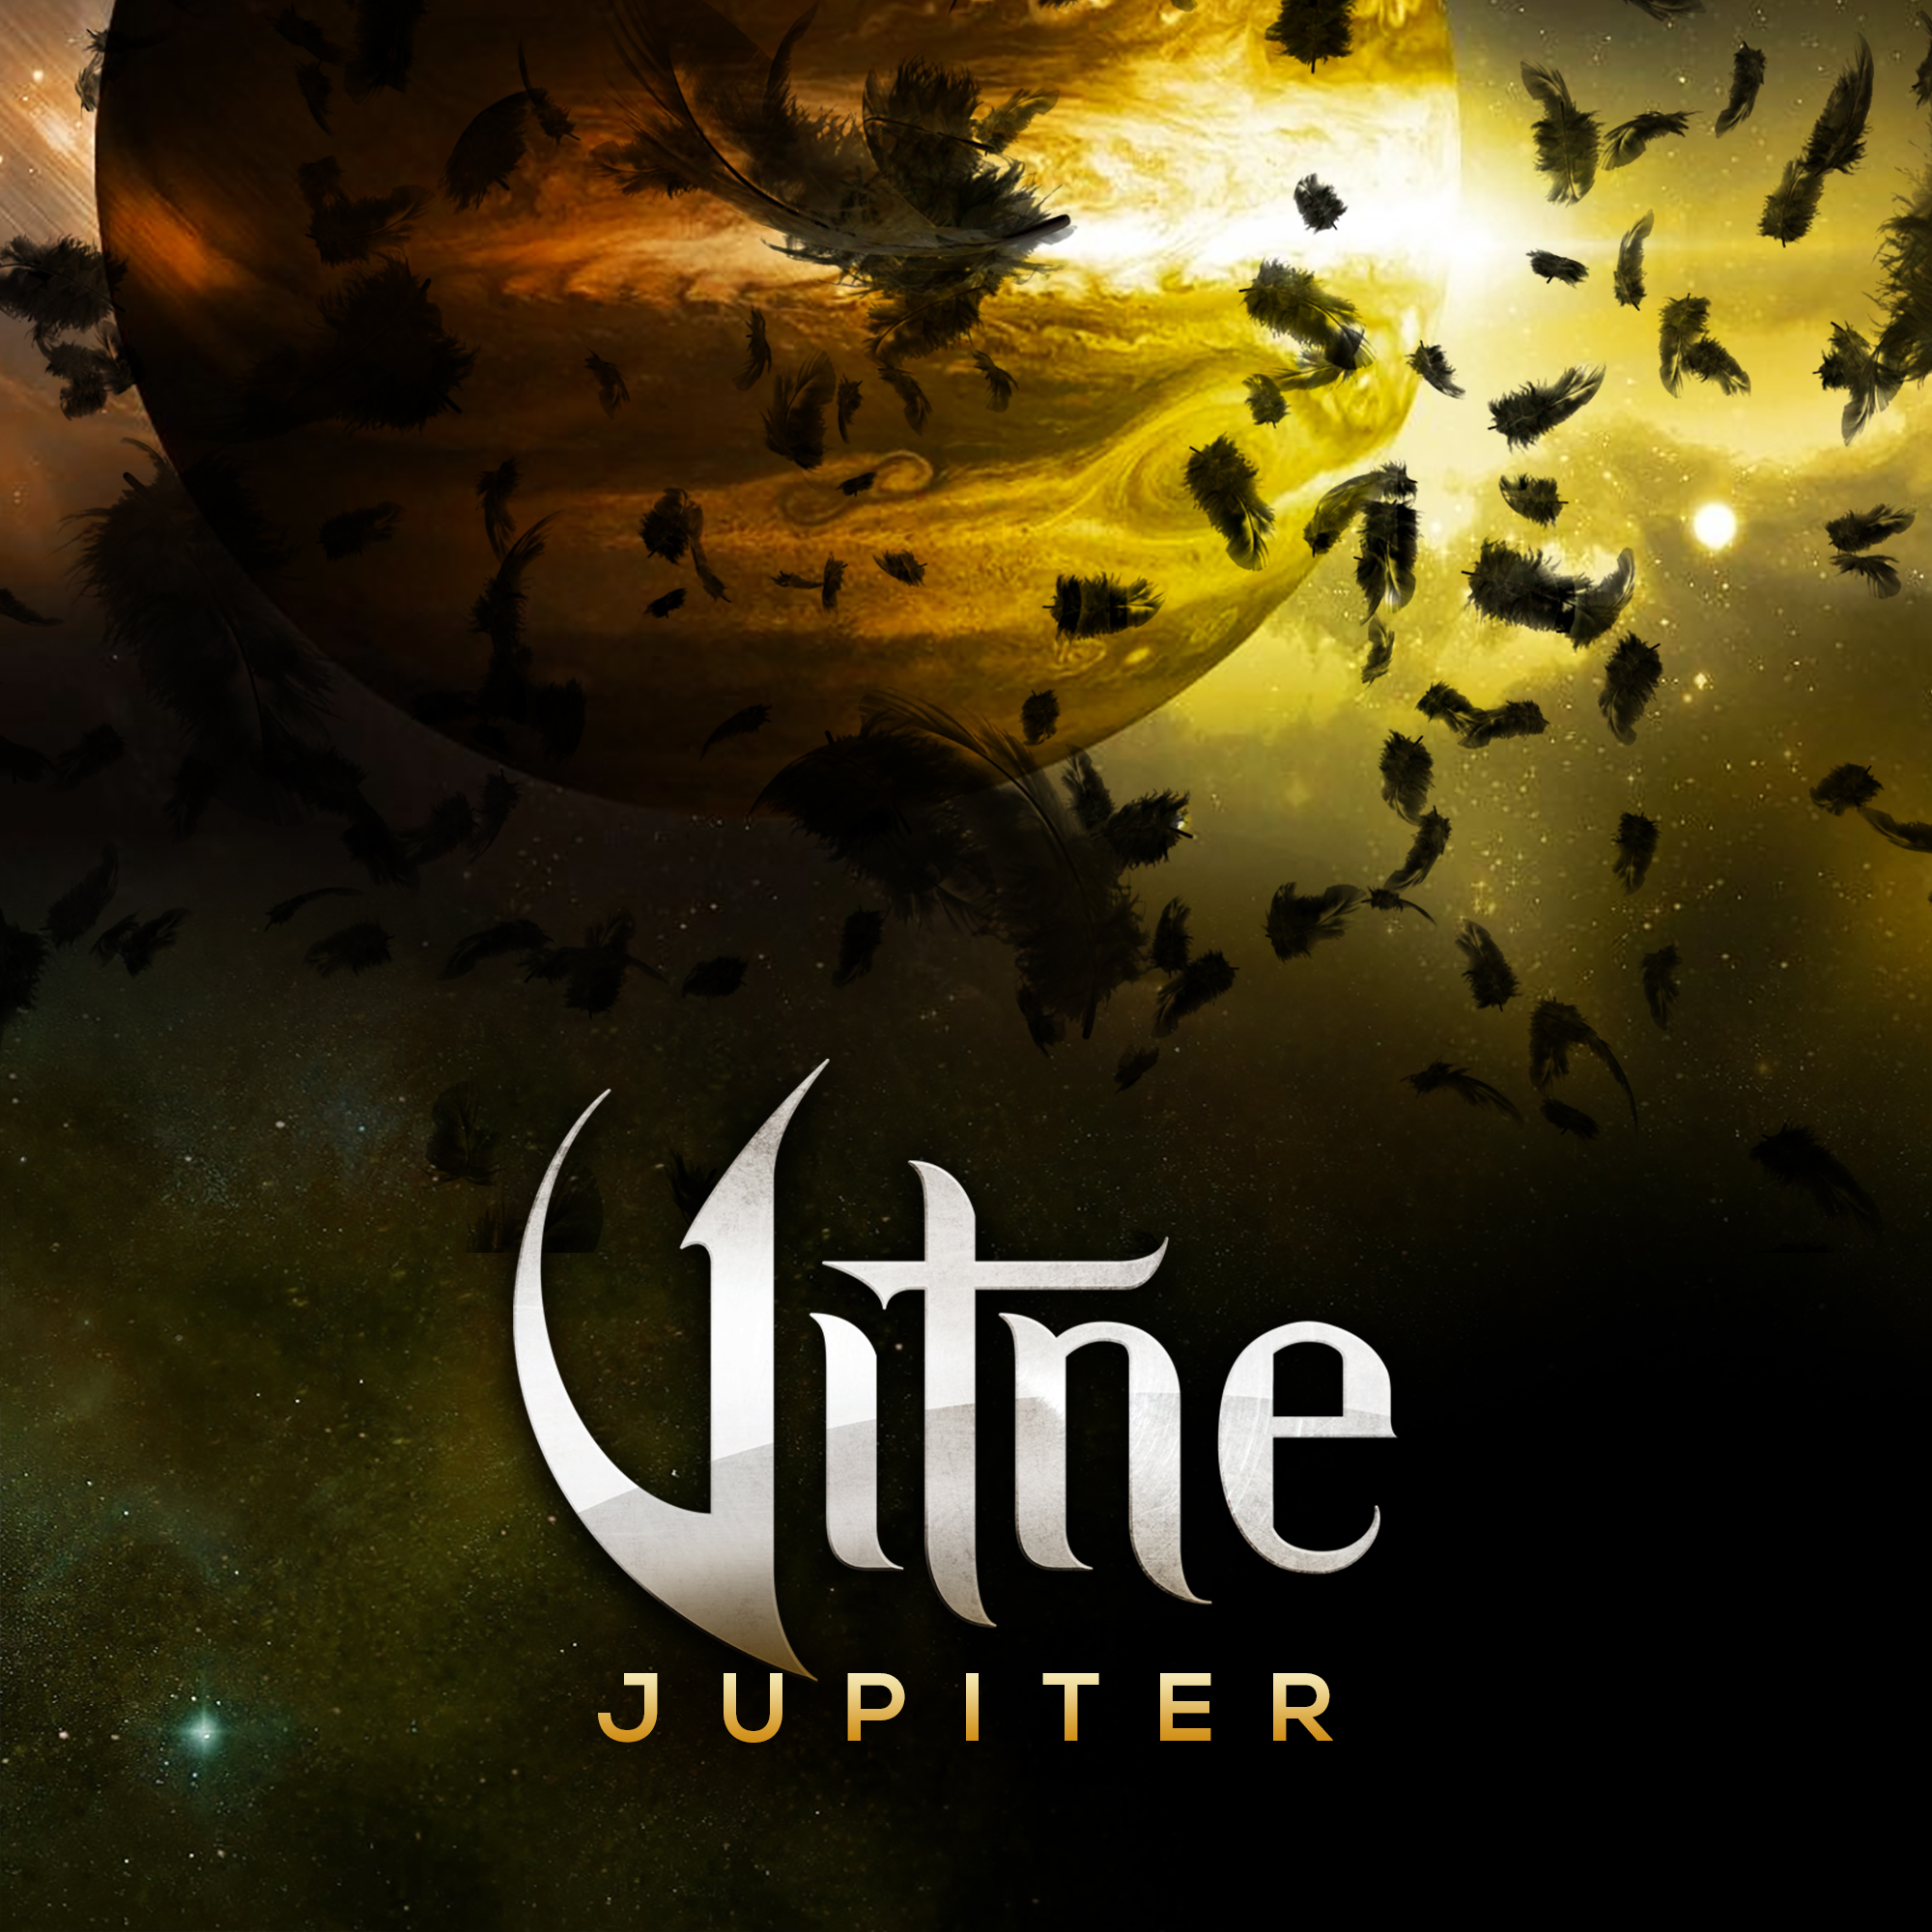 VITNE Jupiter Album Digital